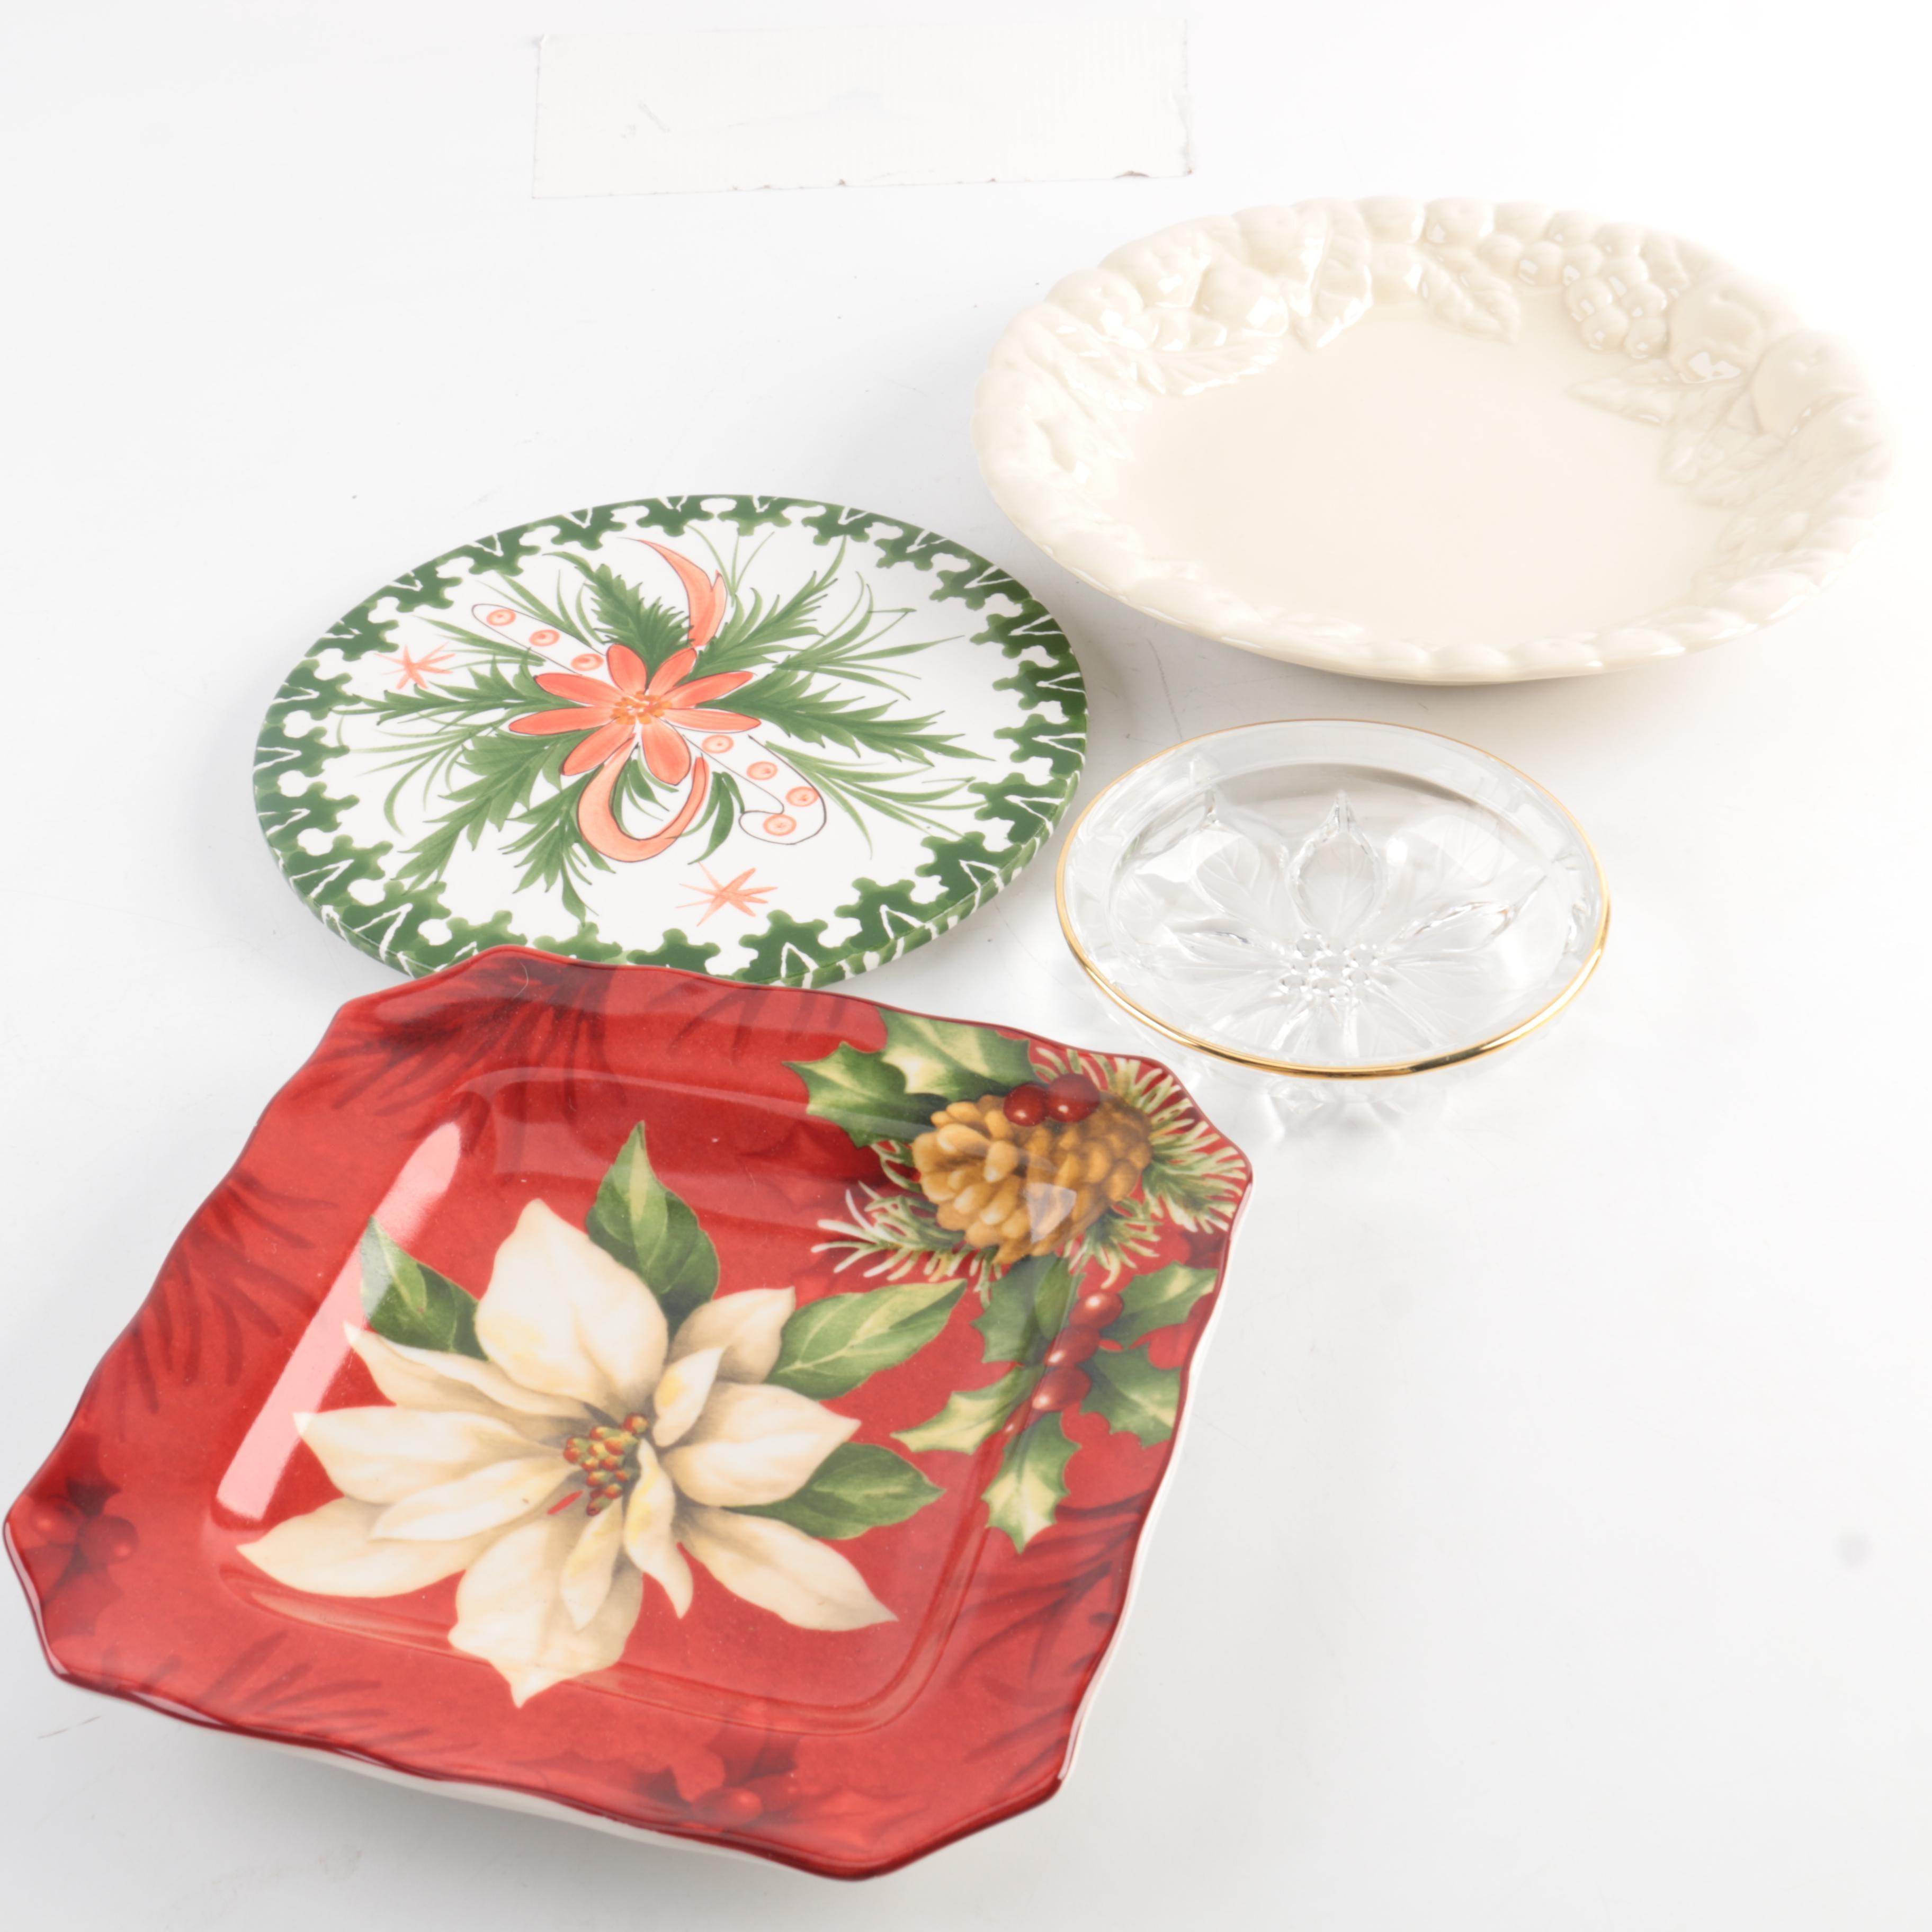 Selection of Seasonal Tableware